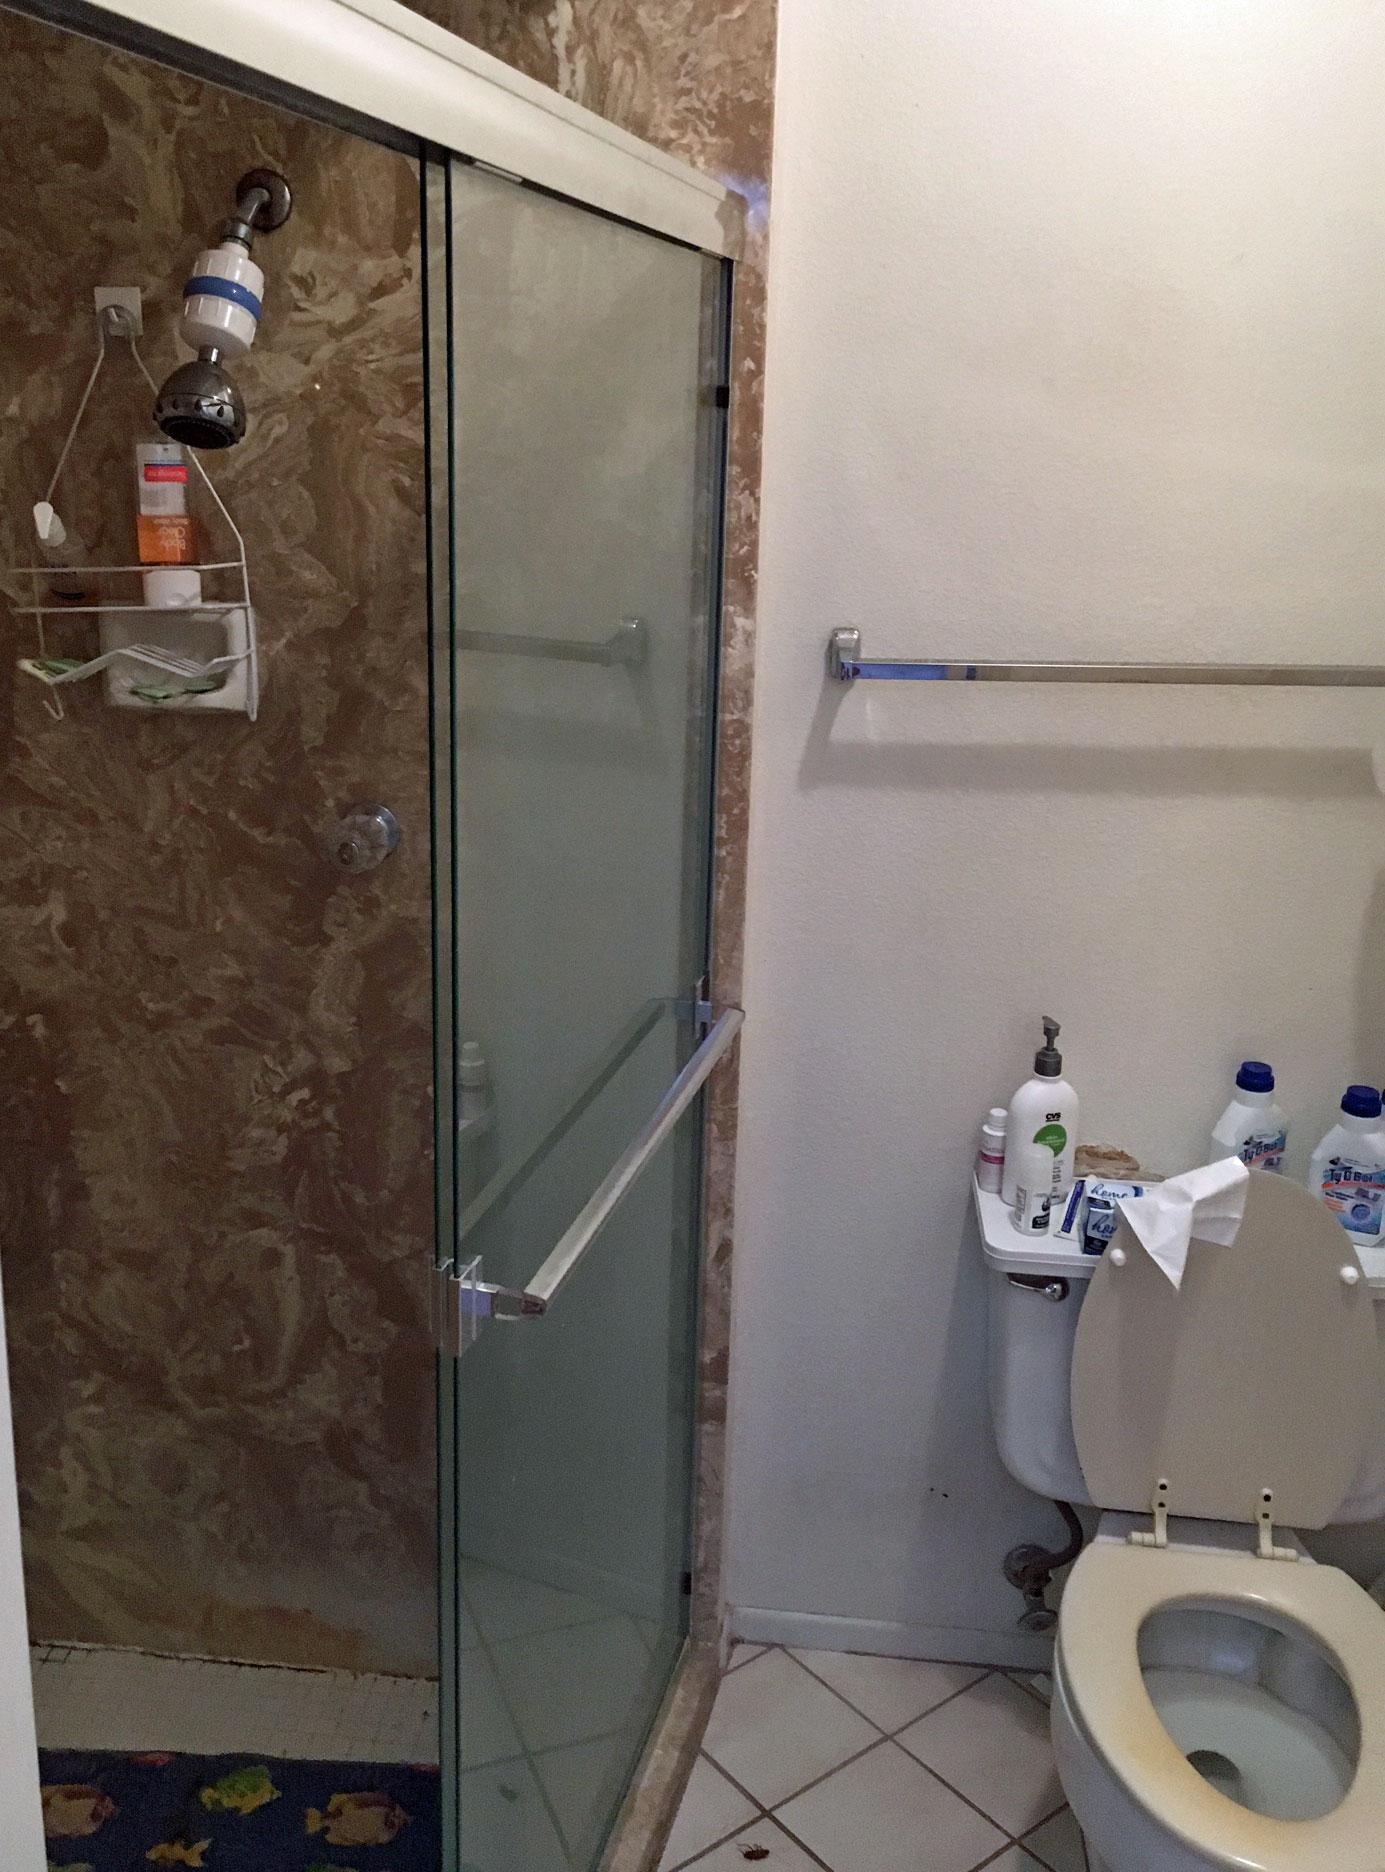 Bathroom Fixtures Tucson casa real townhome tucson arizona